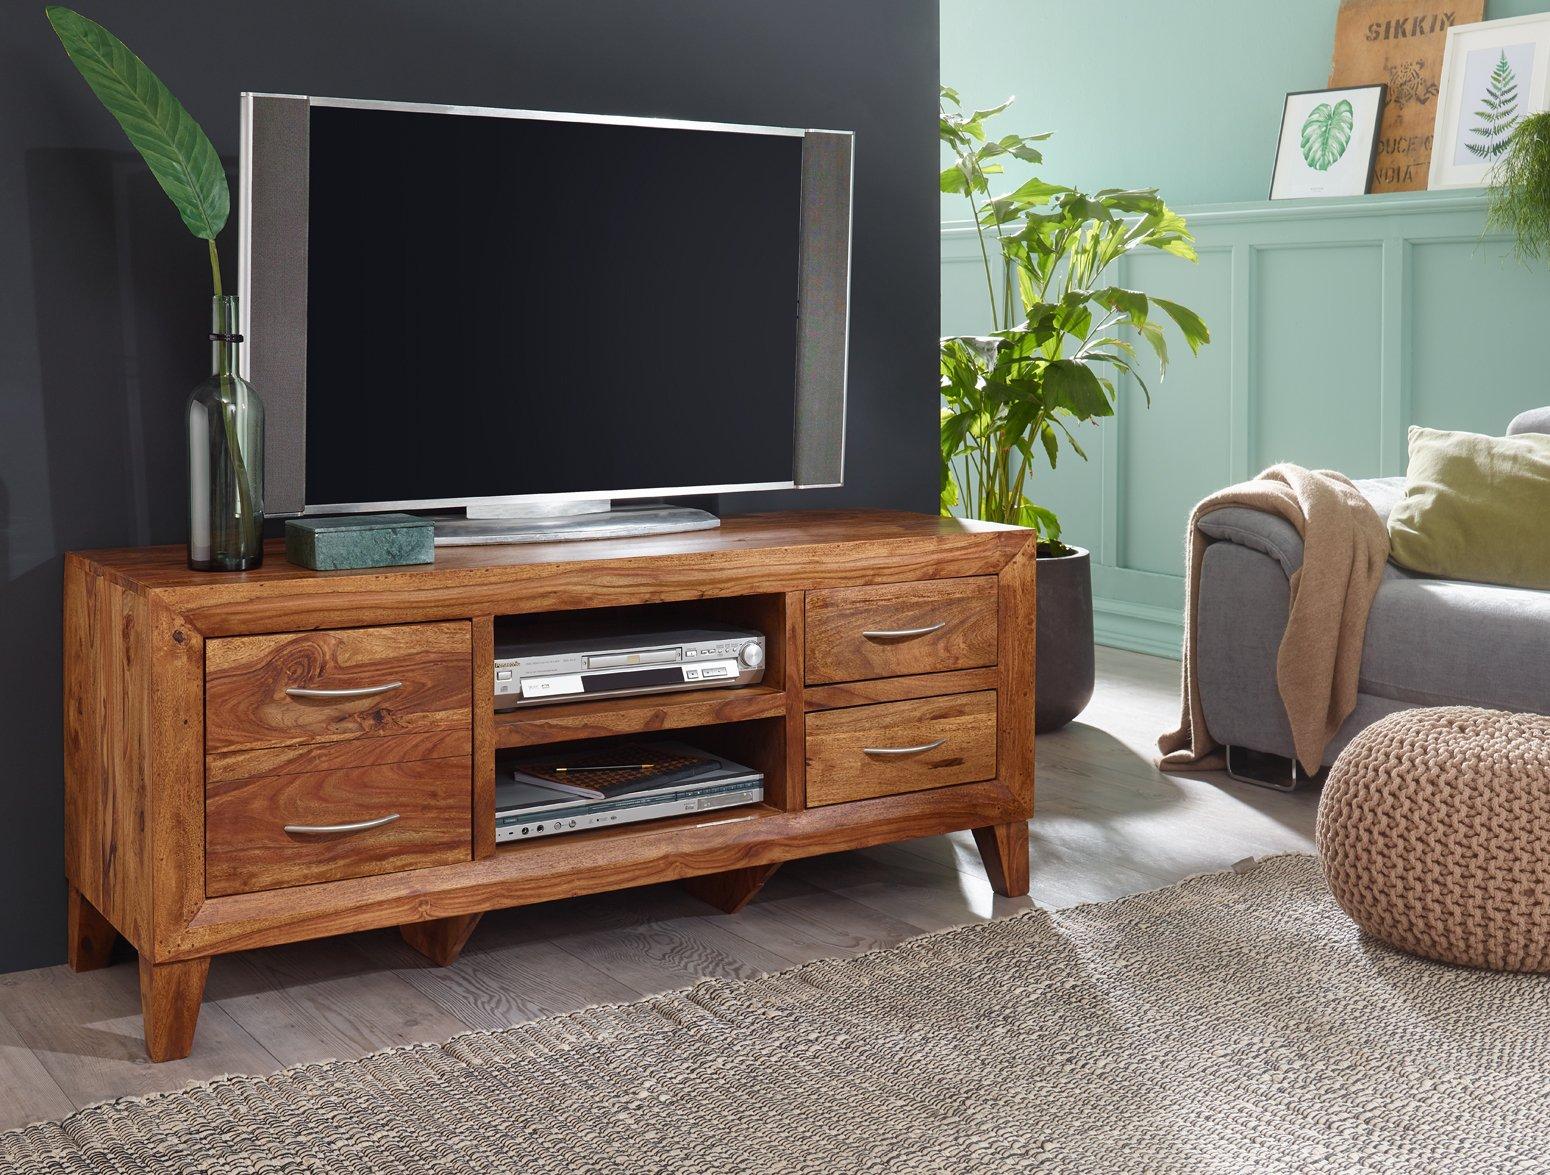 FineBuy mueble madera sheesham – Cómoda 135 cm TV tarjeta estante ...